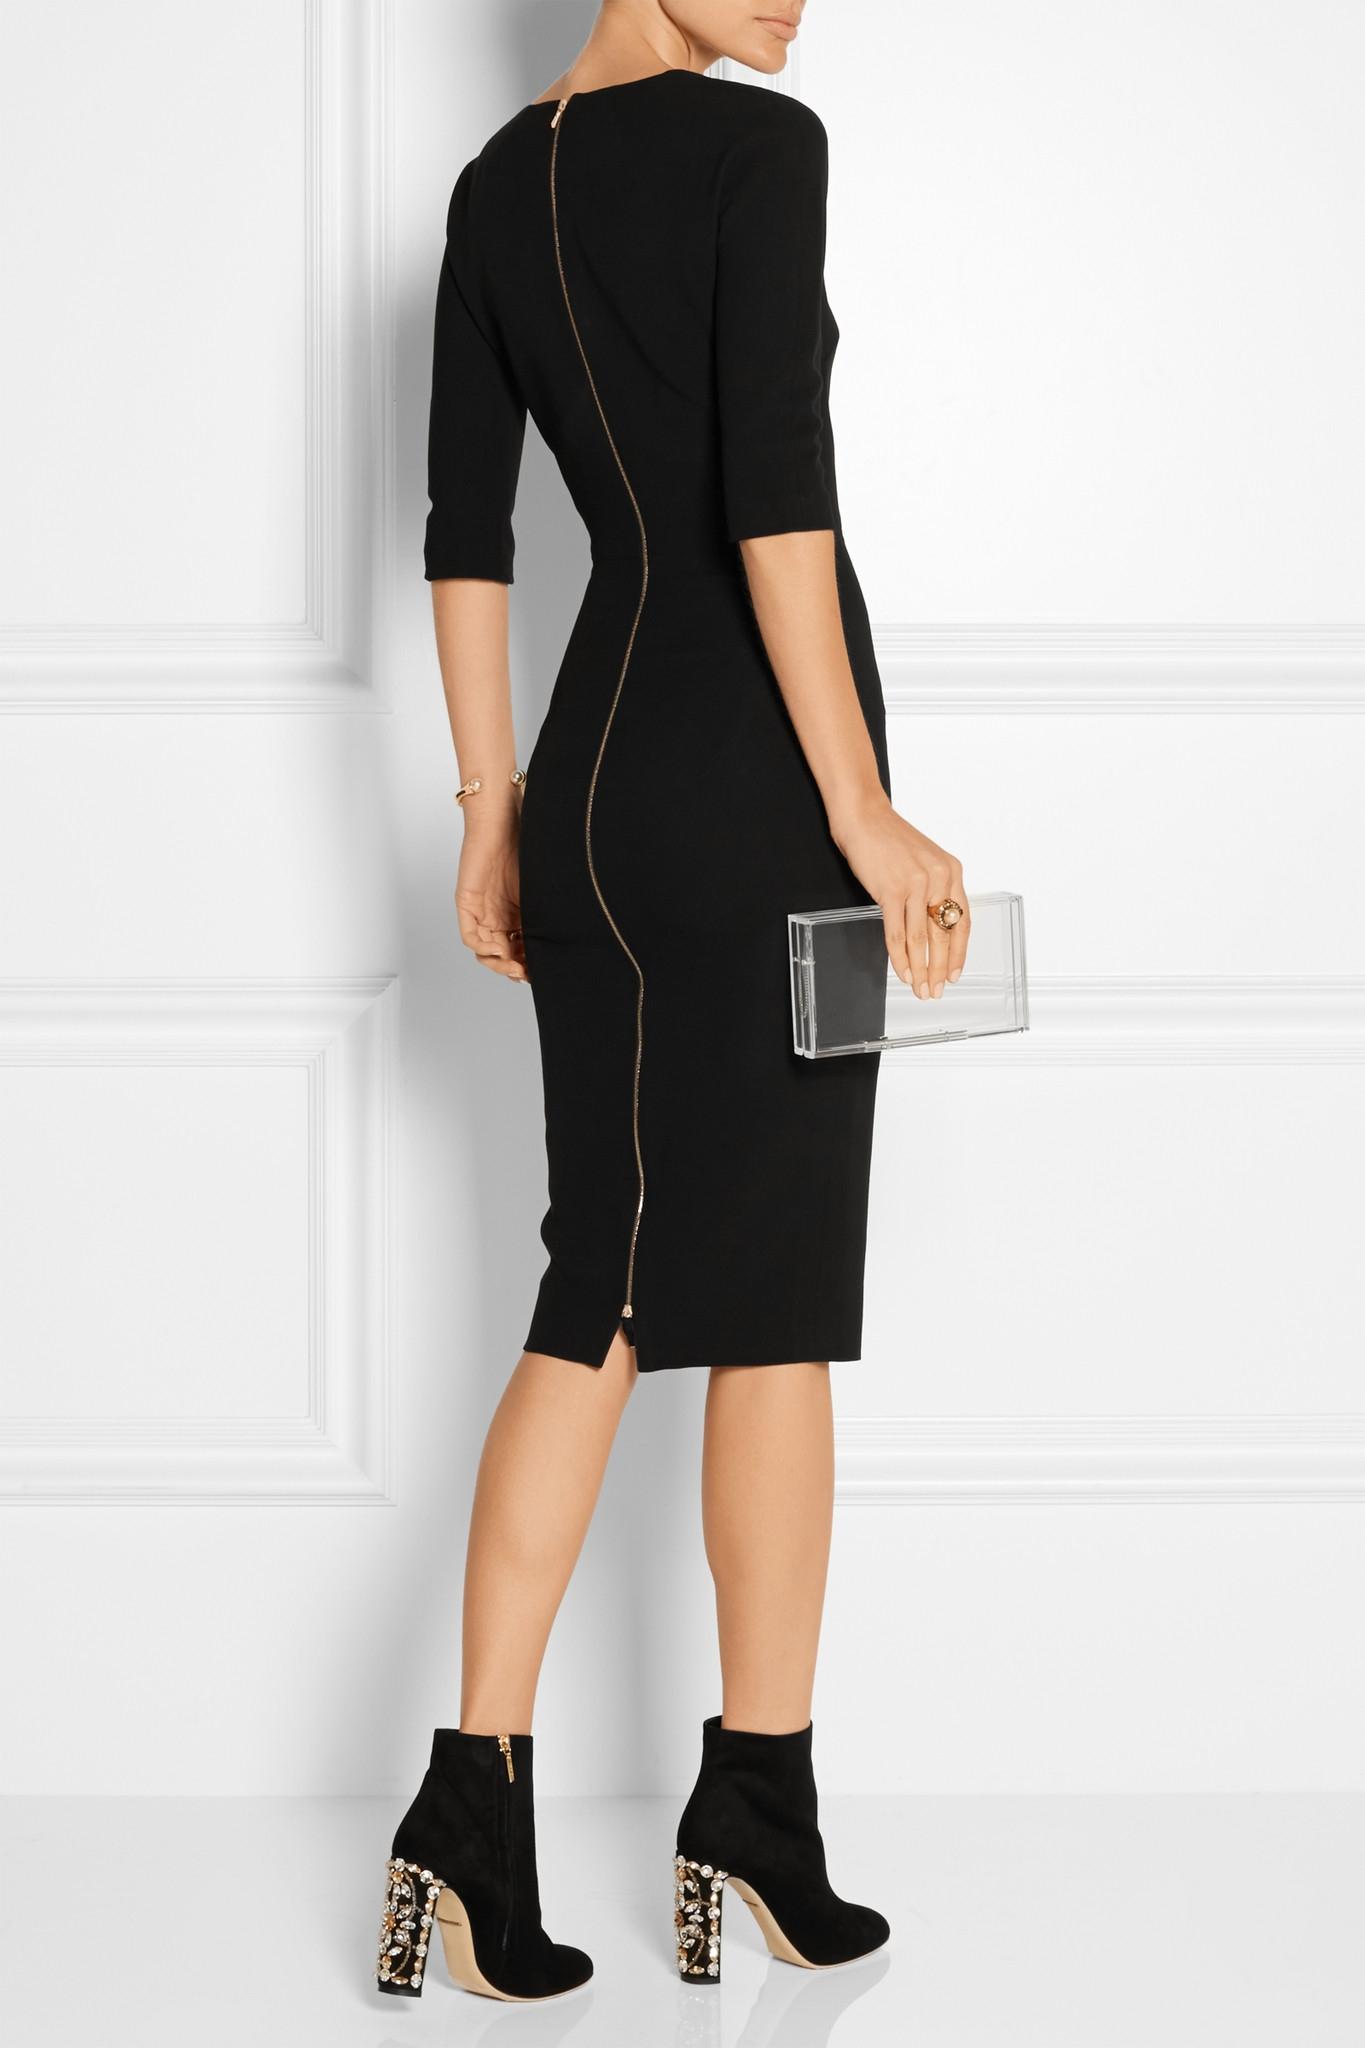 Dolce & Gabbana Crystal-embellished Suede Ankle Boots in Black